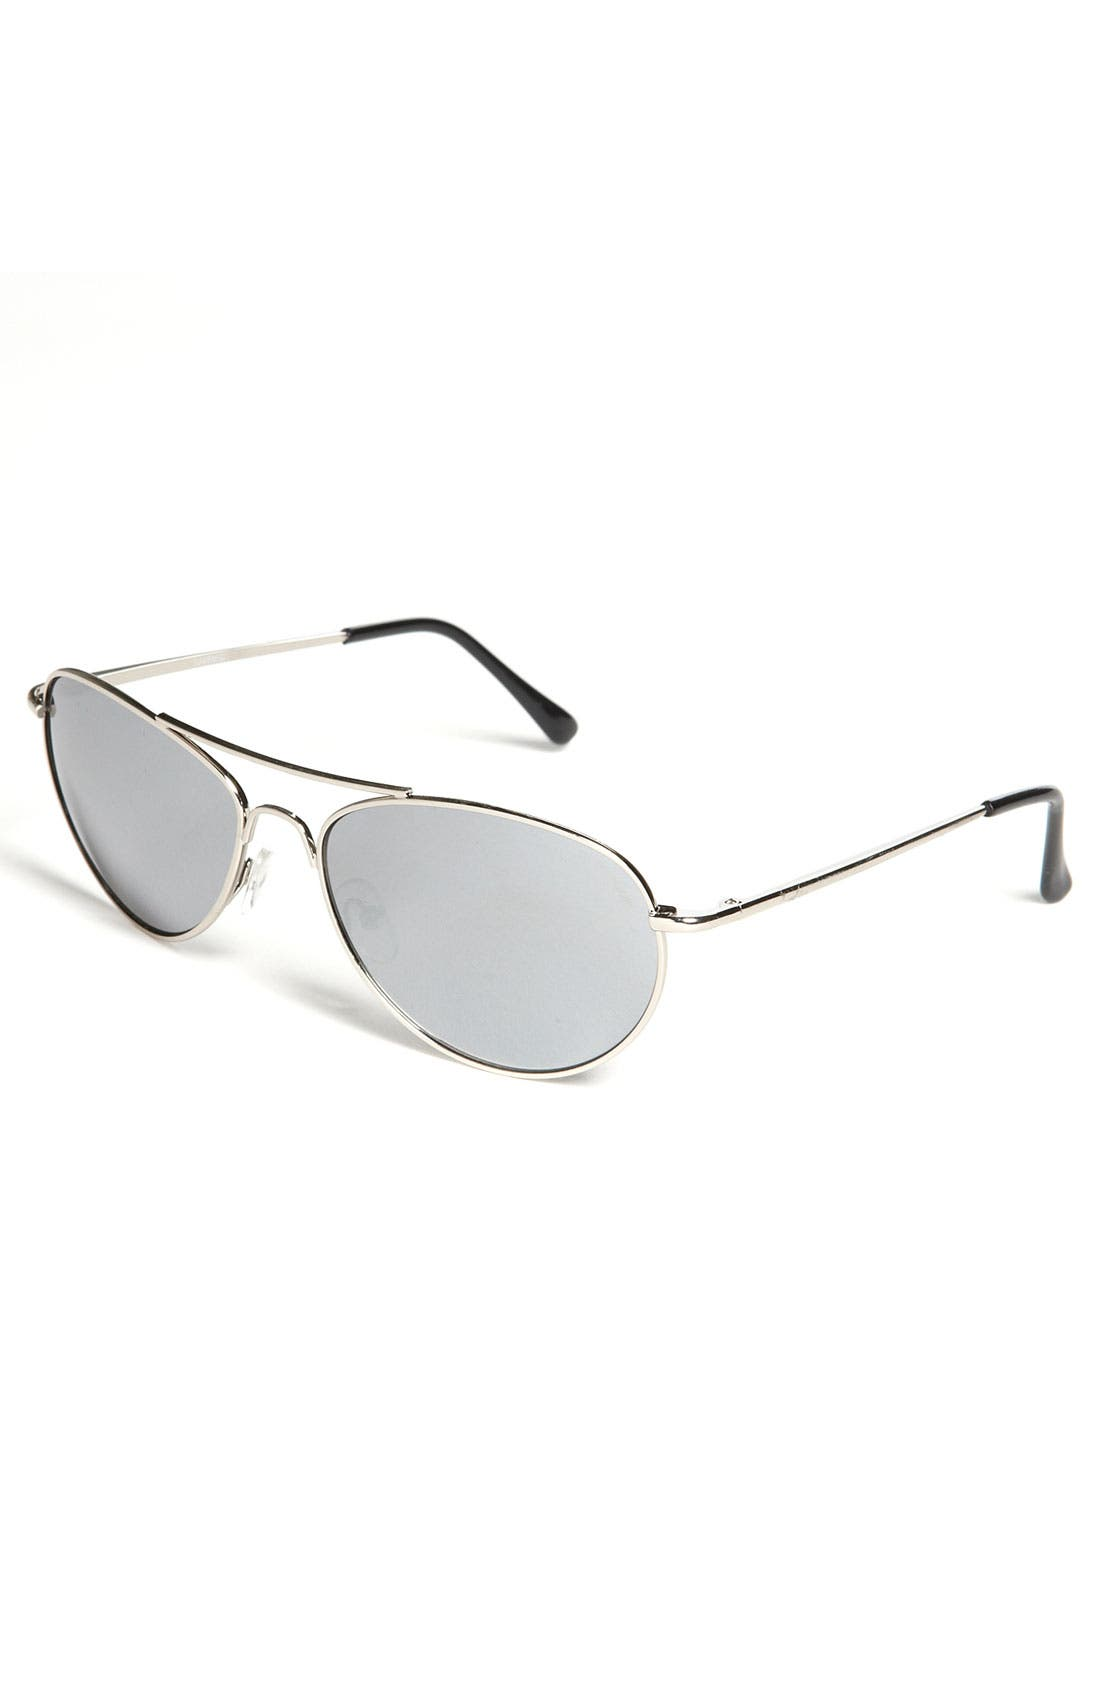 Alternate Image 1 Selected - KW Aviator Sunglasses (Big Boys)